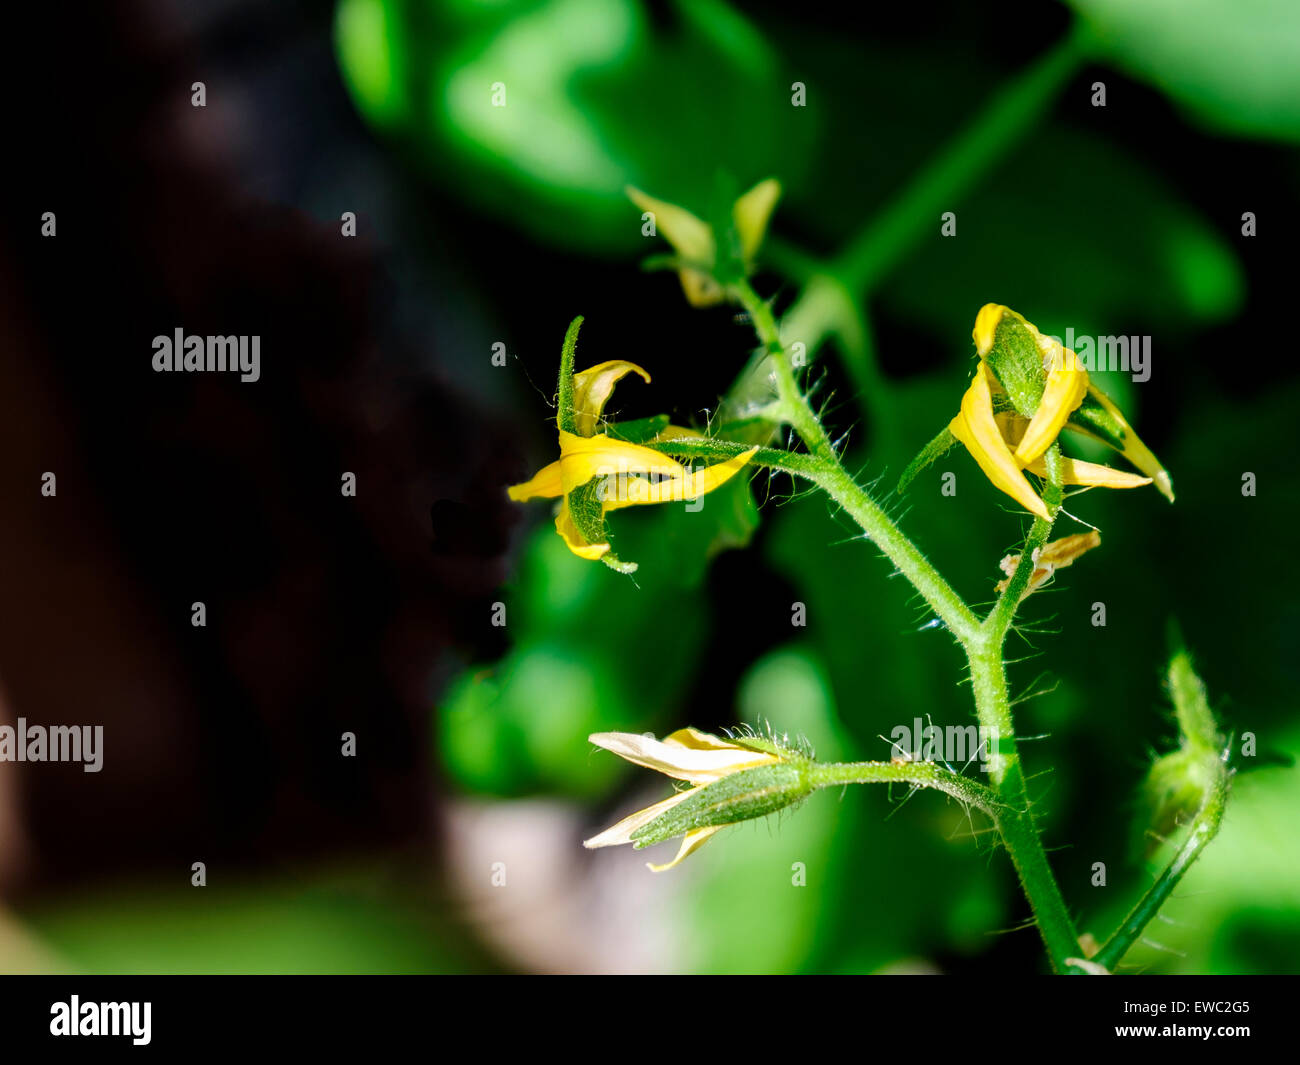 A tomato plant, Solanum lycopersicum, in bloom. USA - Stock Image